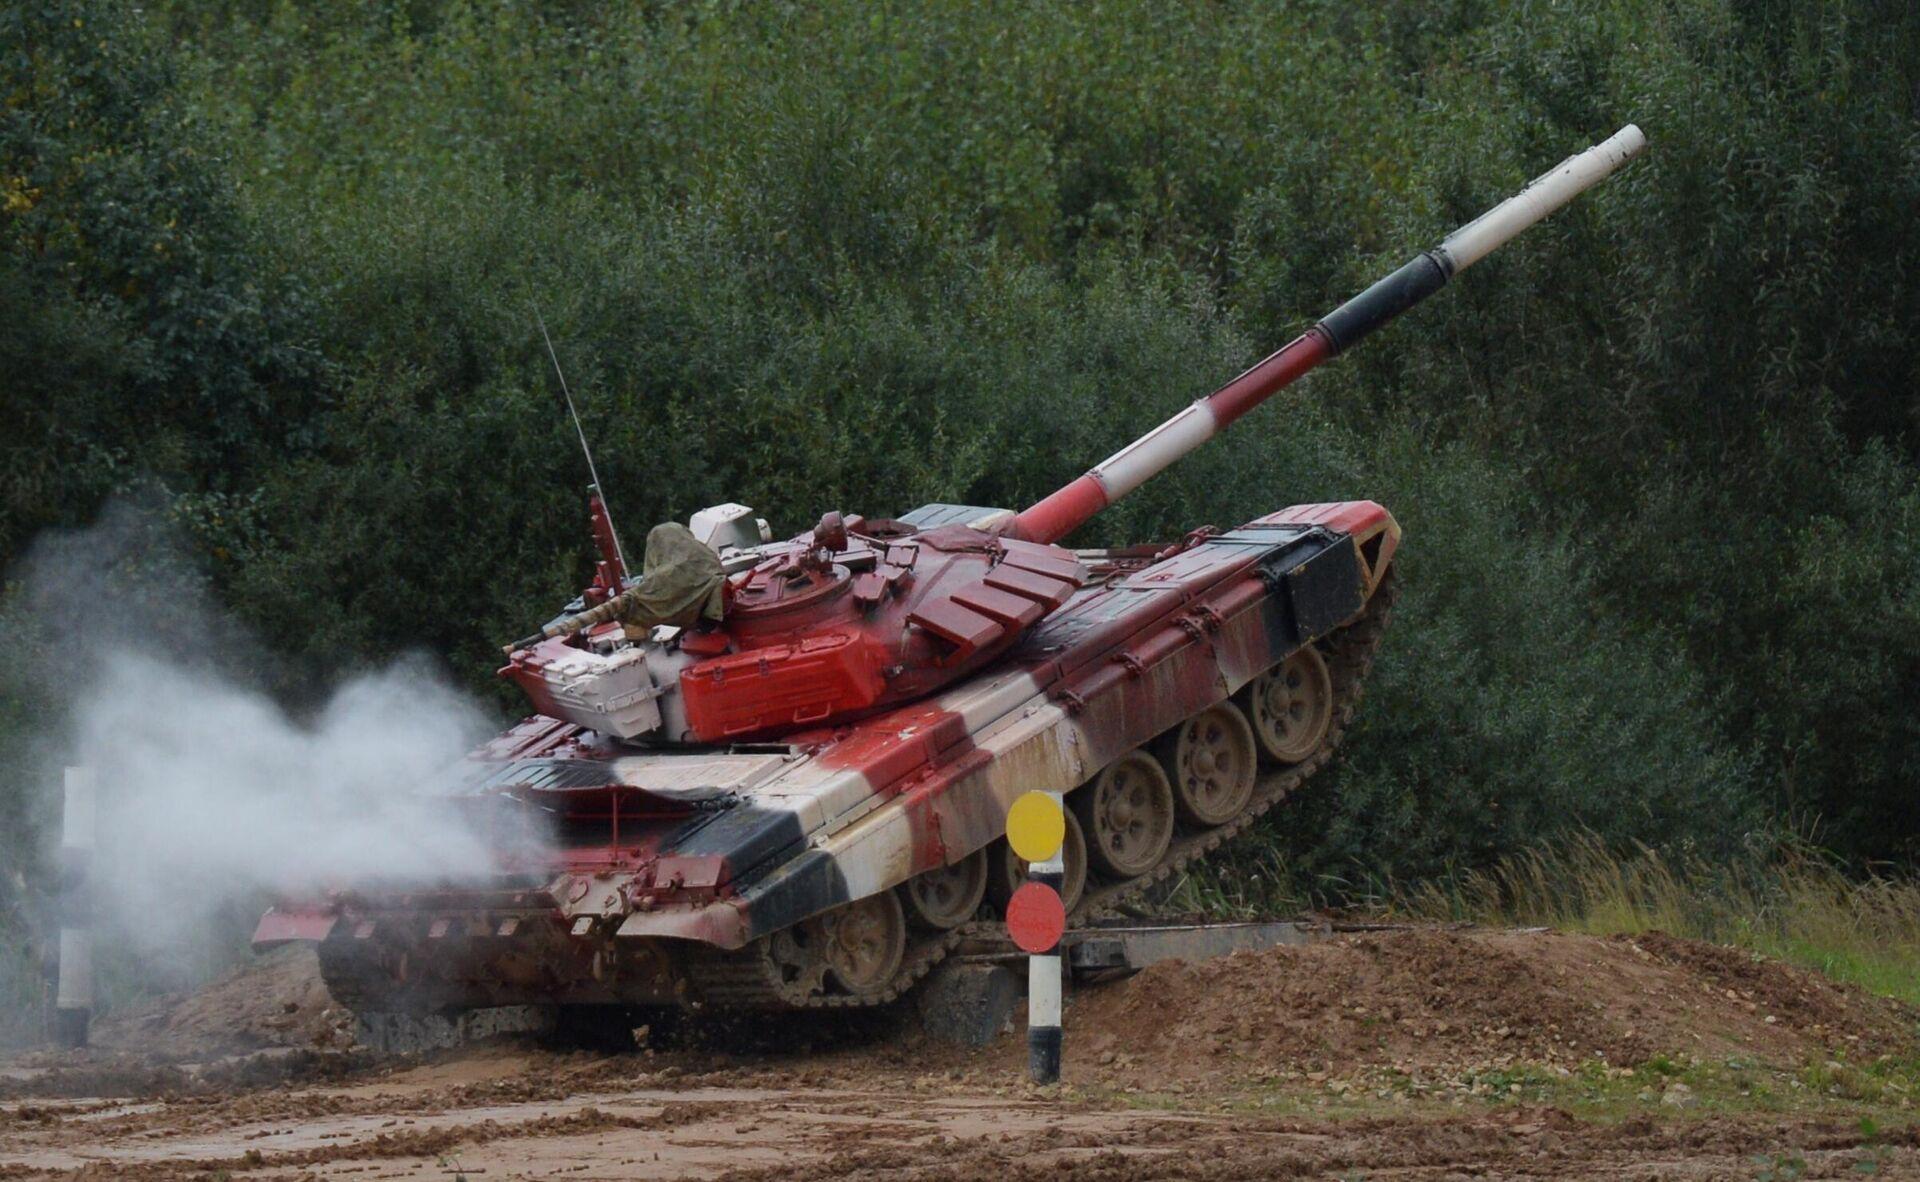 Форум Армия-2021. Танковый биатлон. Финал - Sputnik Таджикистан, 1920, 03.09.2021